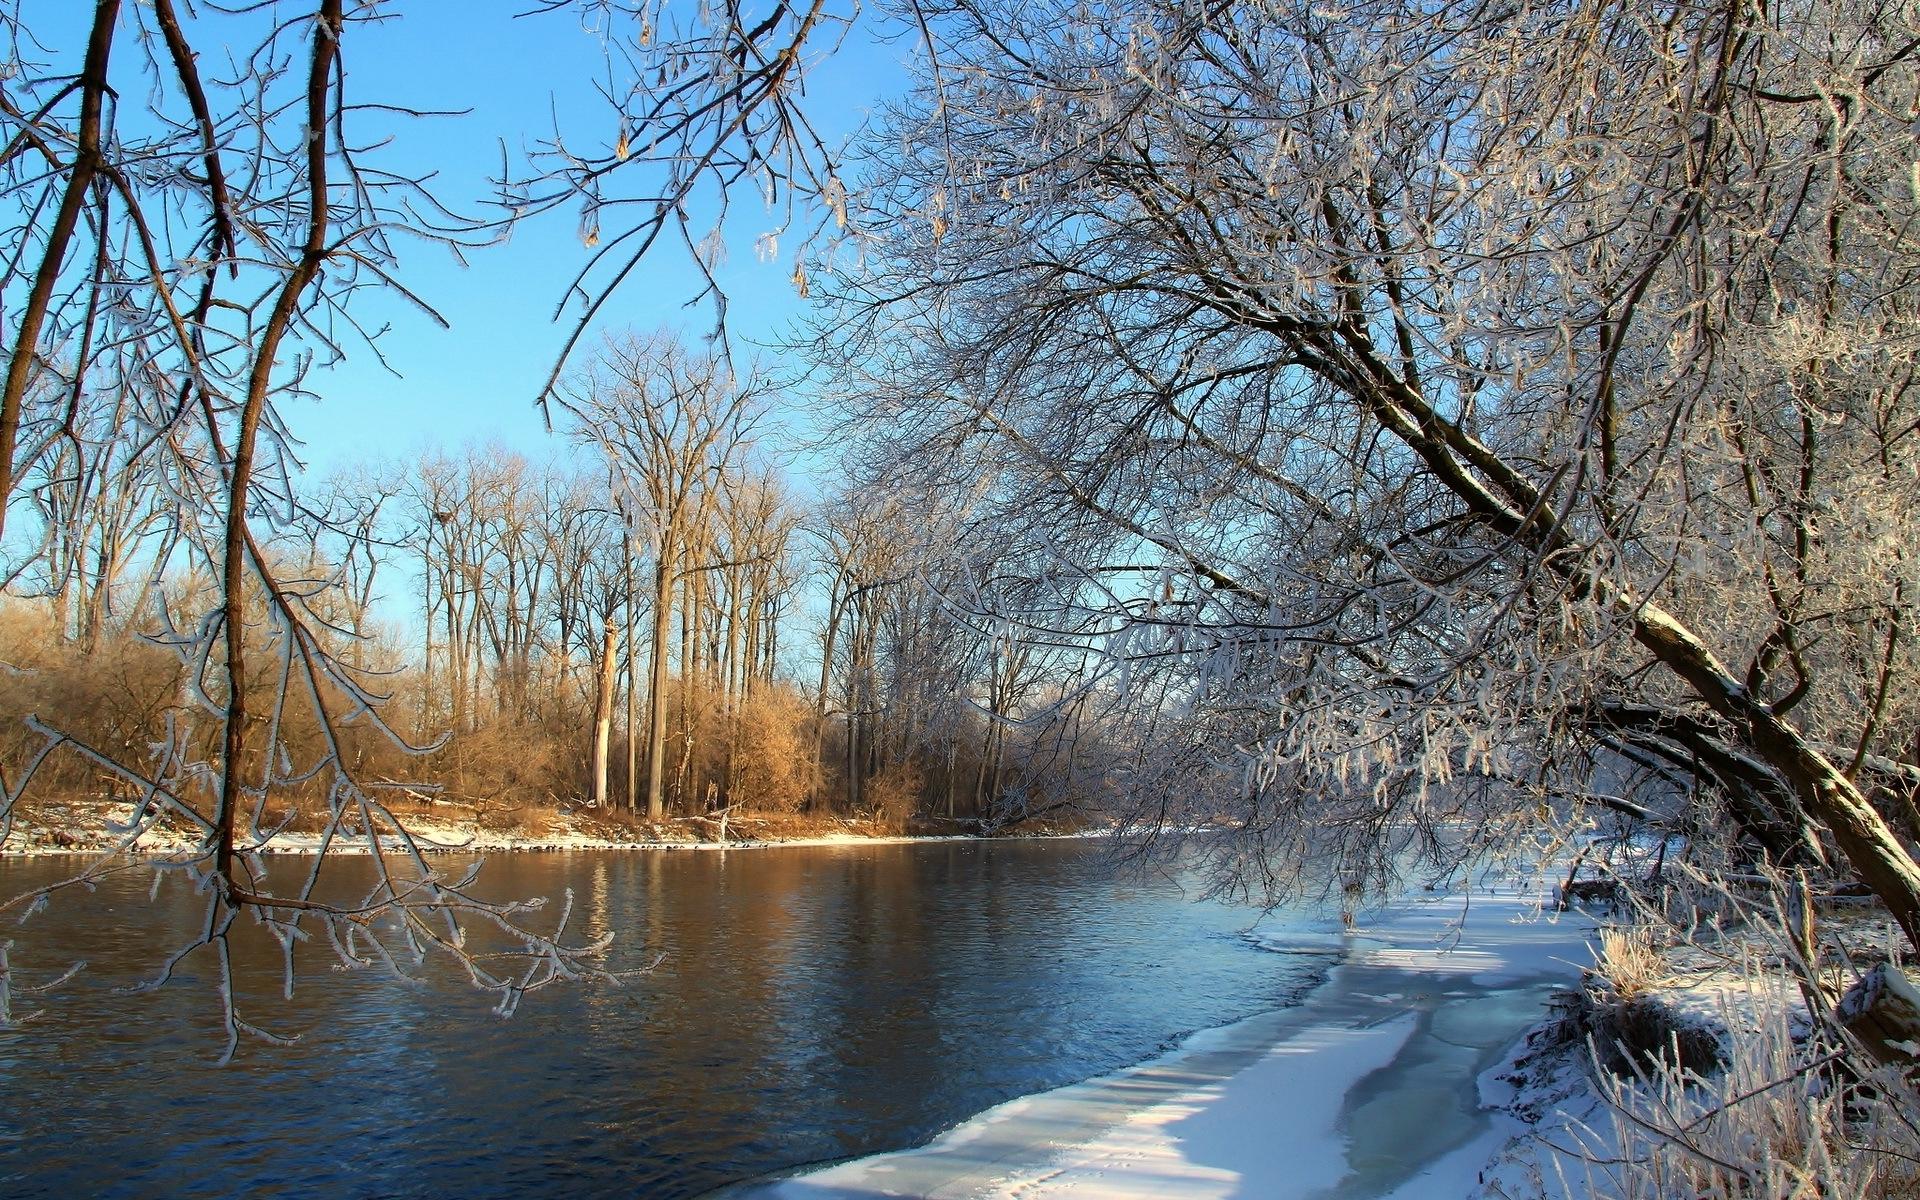 frozen trees widescreen wallpaper - photo #20